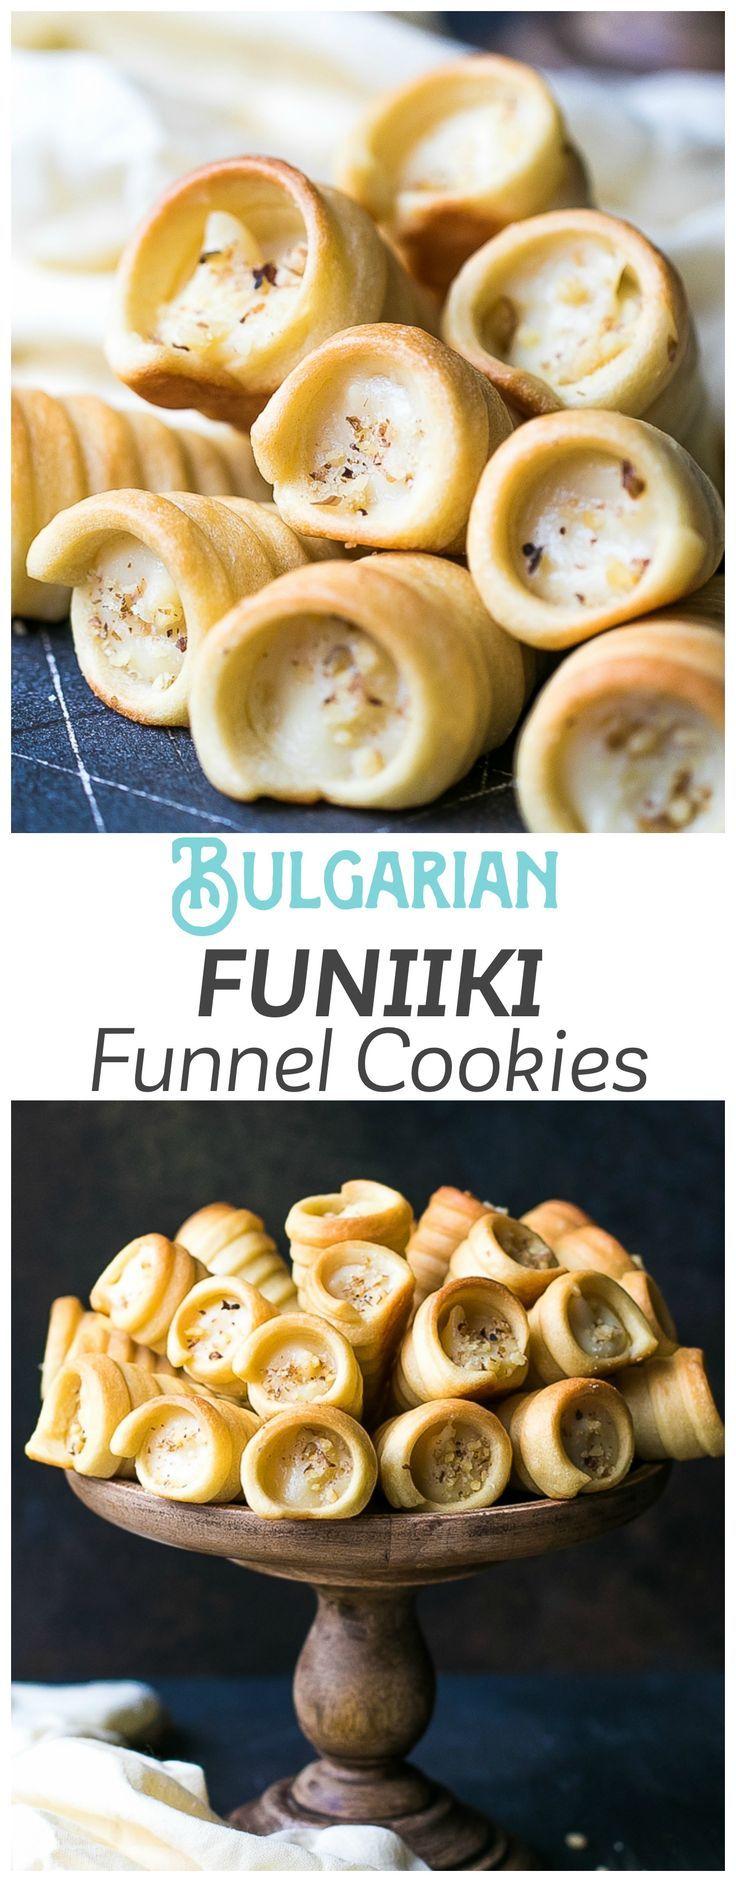 Custard Filled Pastry Horns Recipe (Funnels/Funiiki) via @cookinglsl